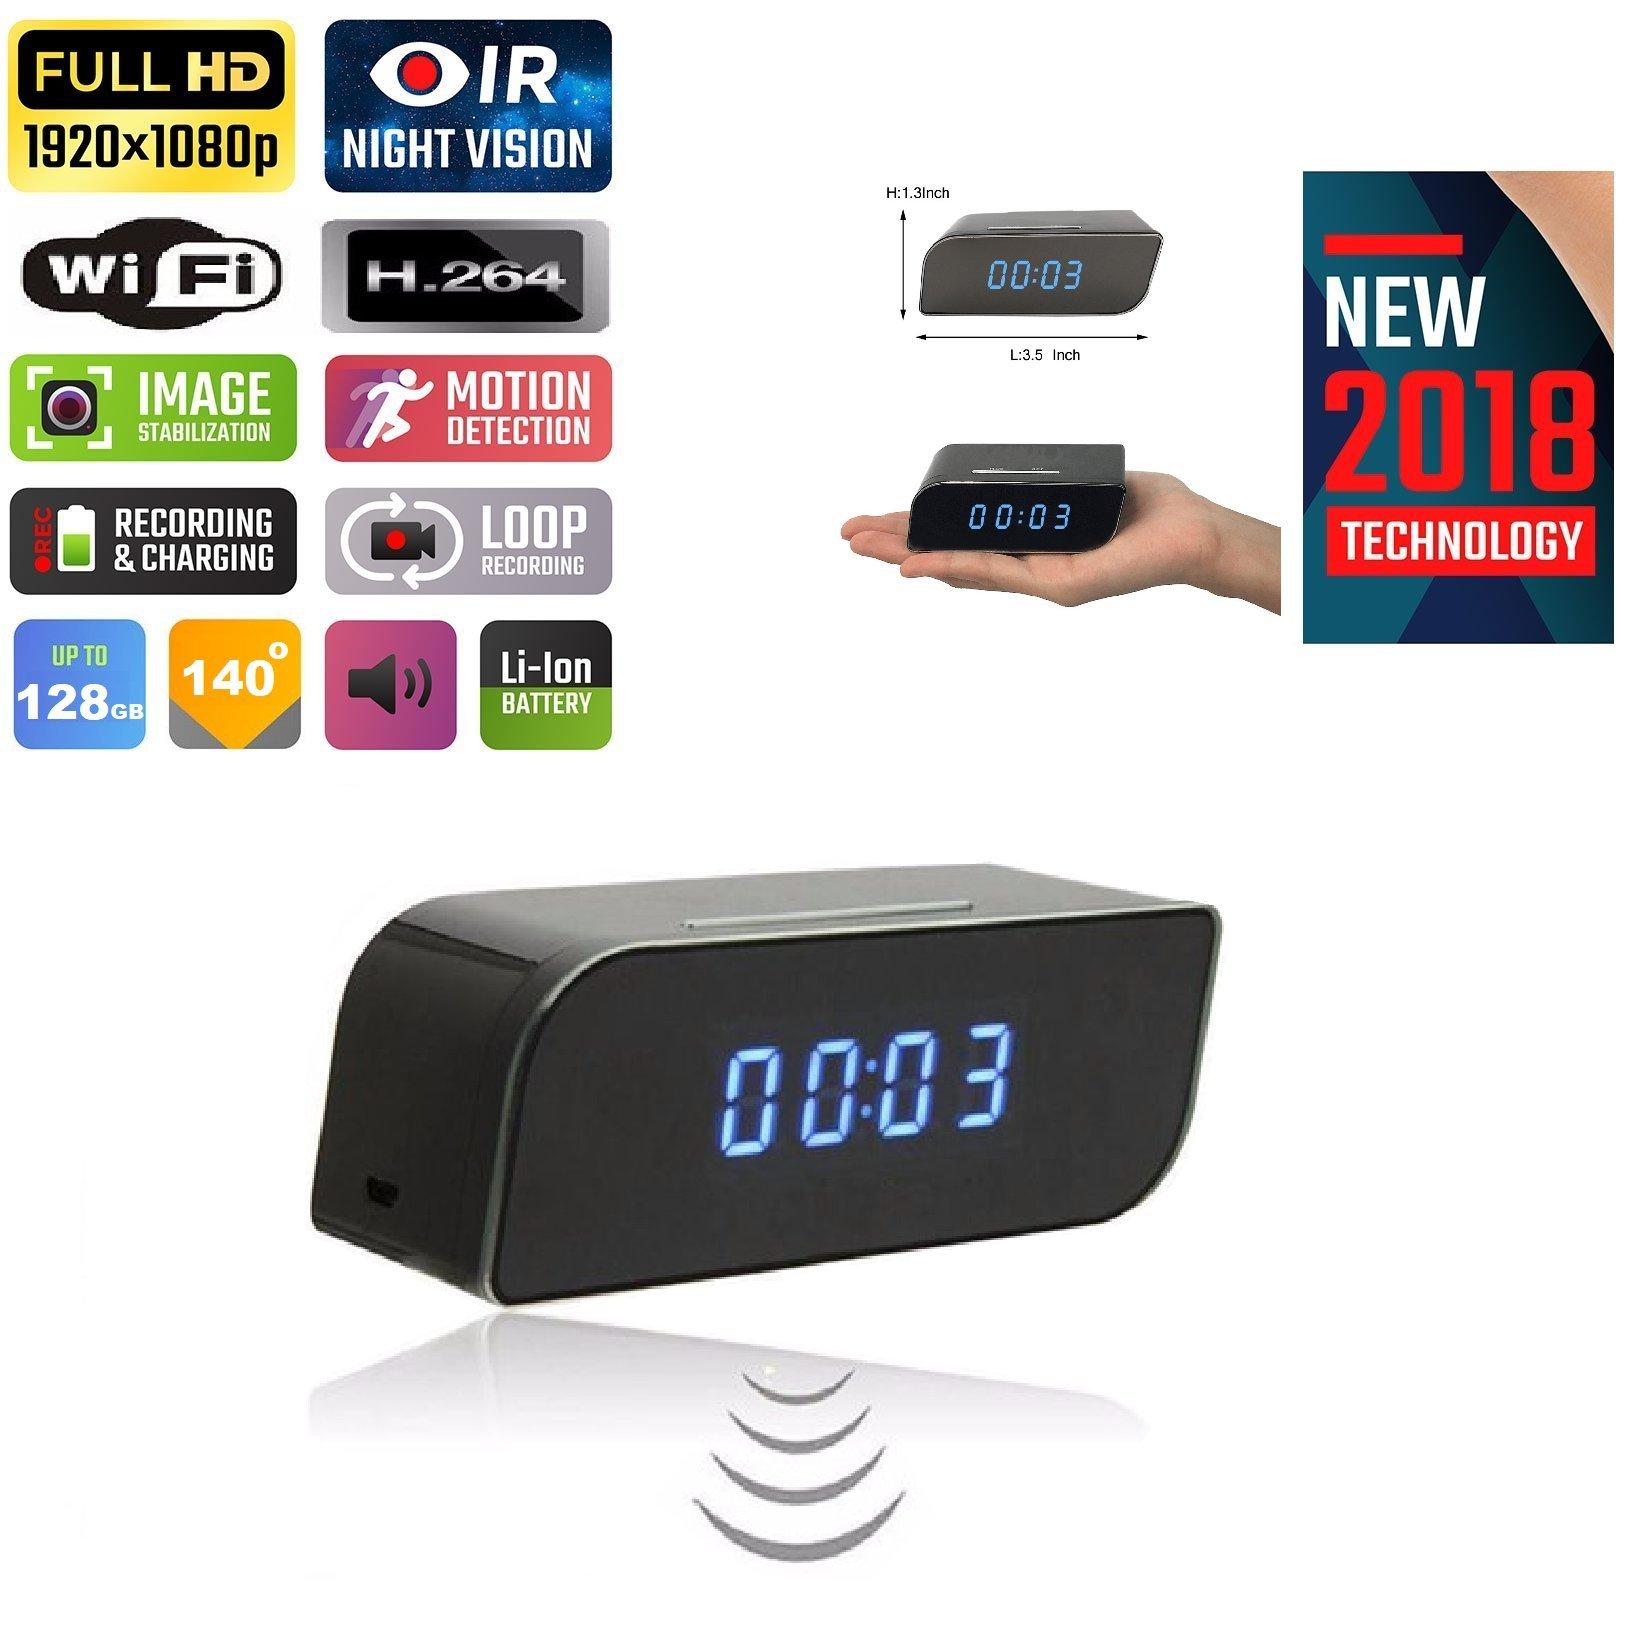 Hidden Spy WiFi Camera Alarm Clock Mini Night Vision IR Secret Home Security Nanny Cam IP Wireless cam HD 1080P Baby Monitor Audio Video Recorder IP 128GB Motion Detection 140°Wide Angle Lens TMCUS